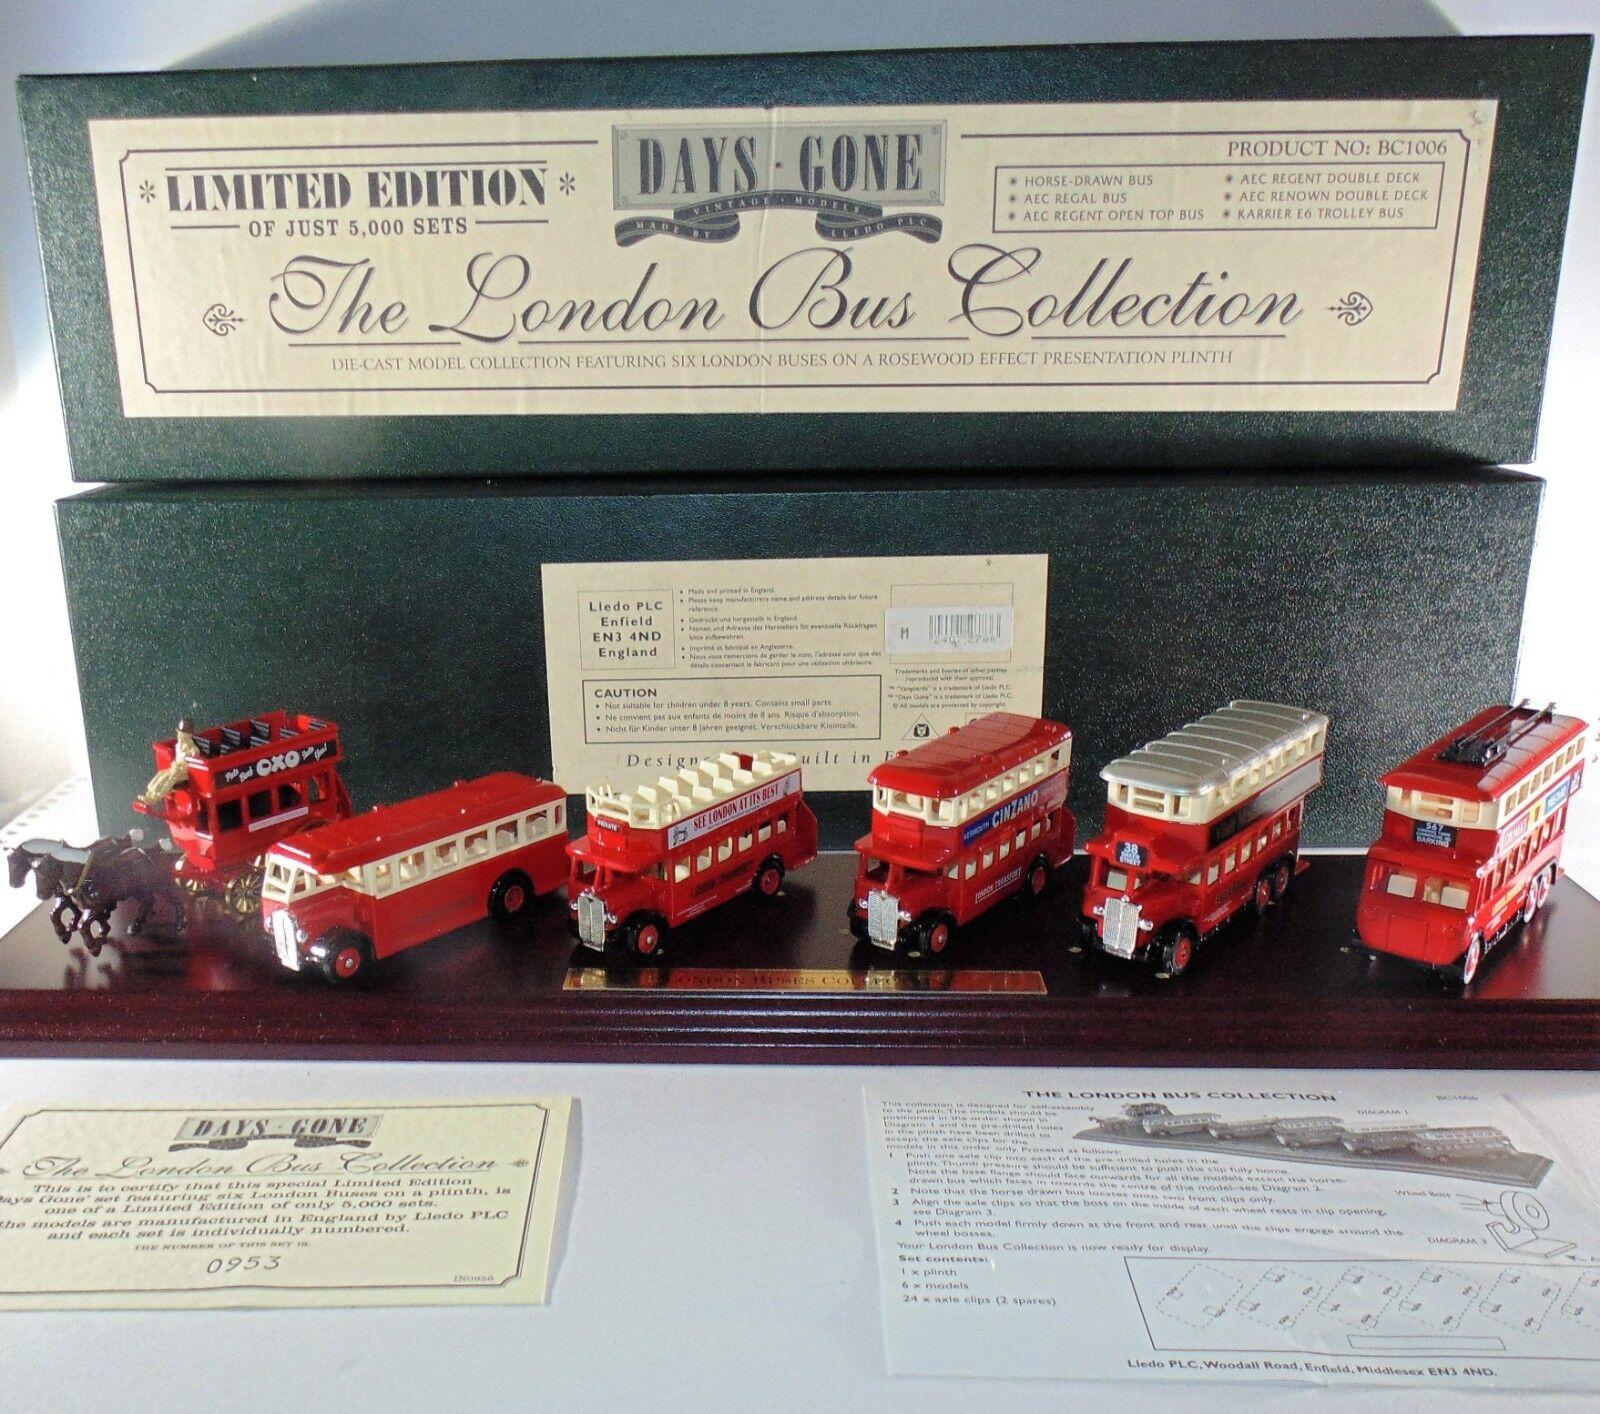 Die londoner bus - sammlung - bc1006 - lledo plc - ltd v & - coa - boxen.